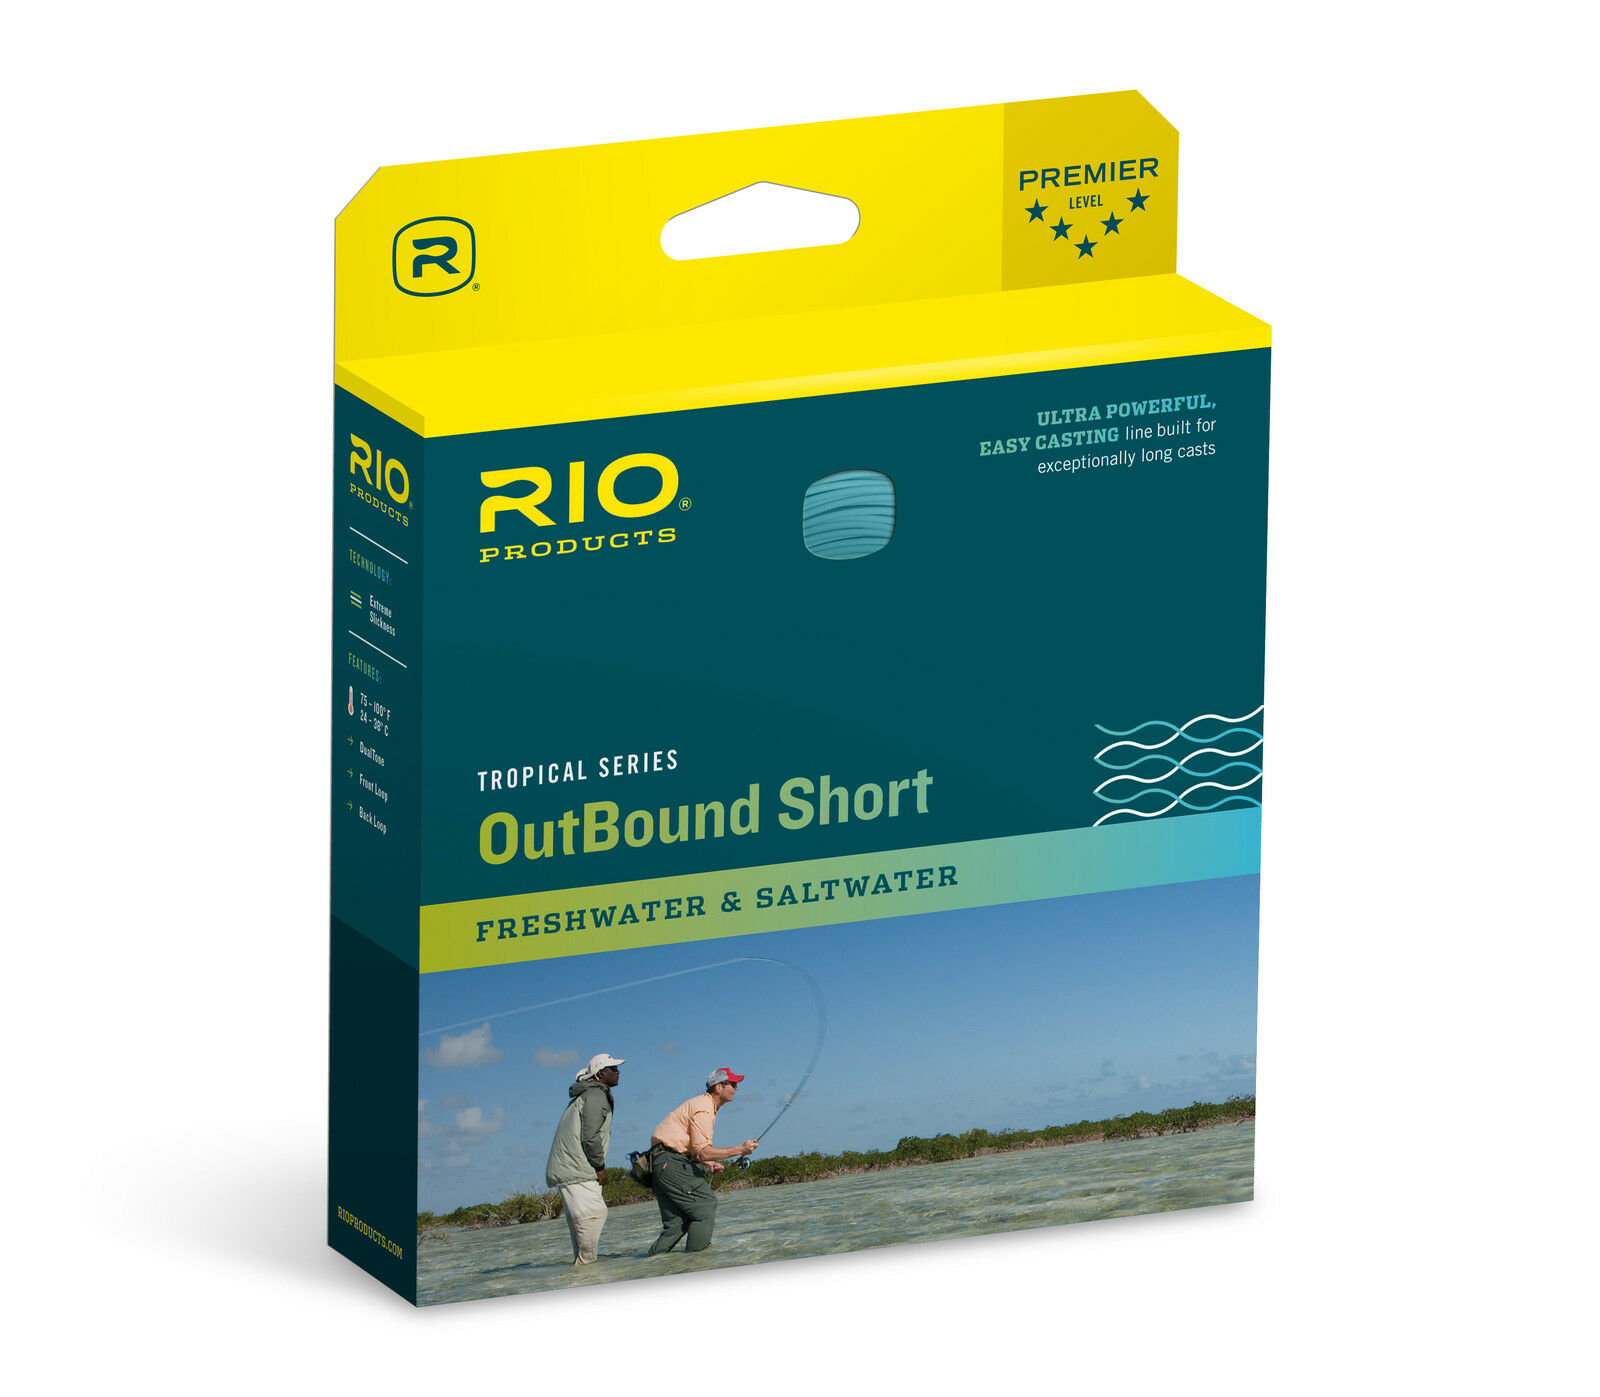 Rio Tropical Outbound Short Fly Line, WF9FI...30' Intermediate Head, nuovo